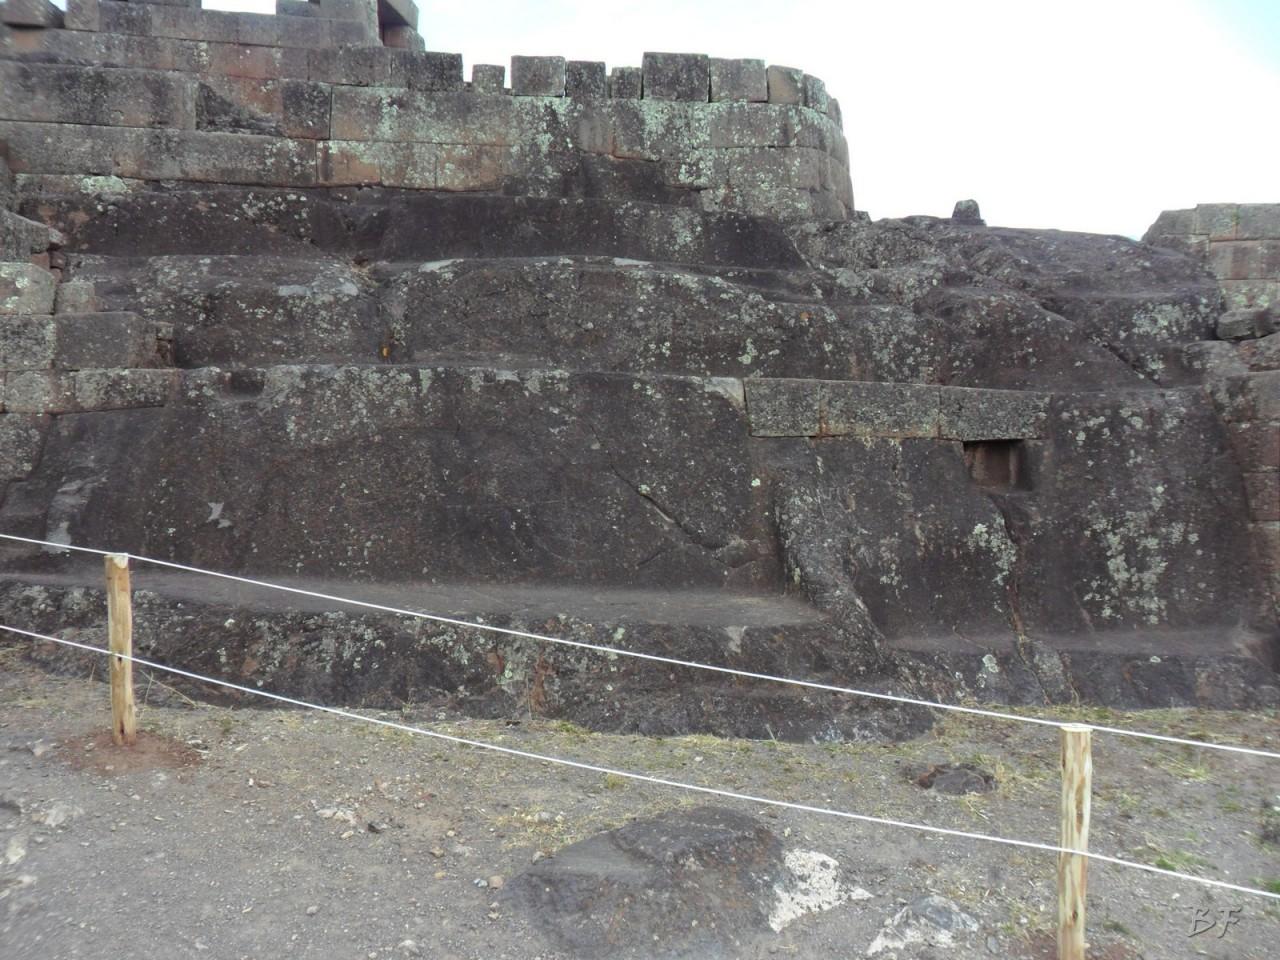 Mura-Poligonali-Megaliti-Altari-Rupestri-Pisac-Cusco-Perù-70